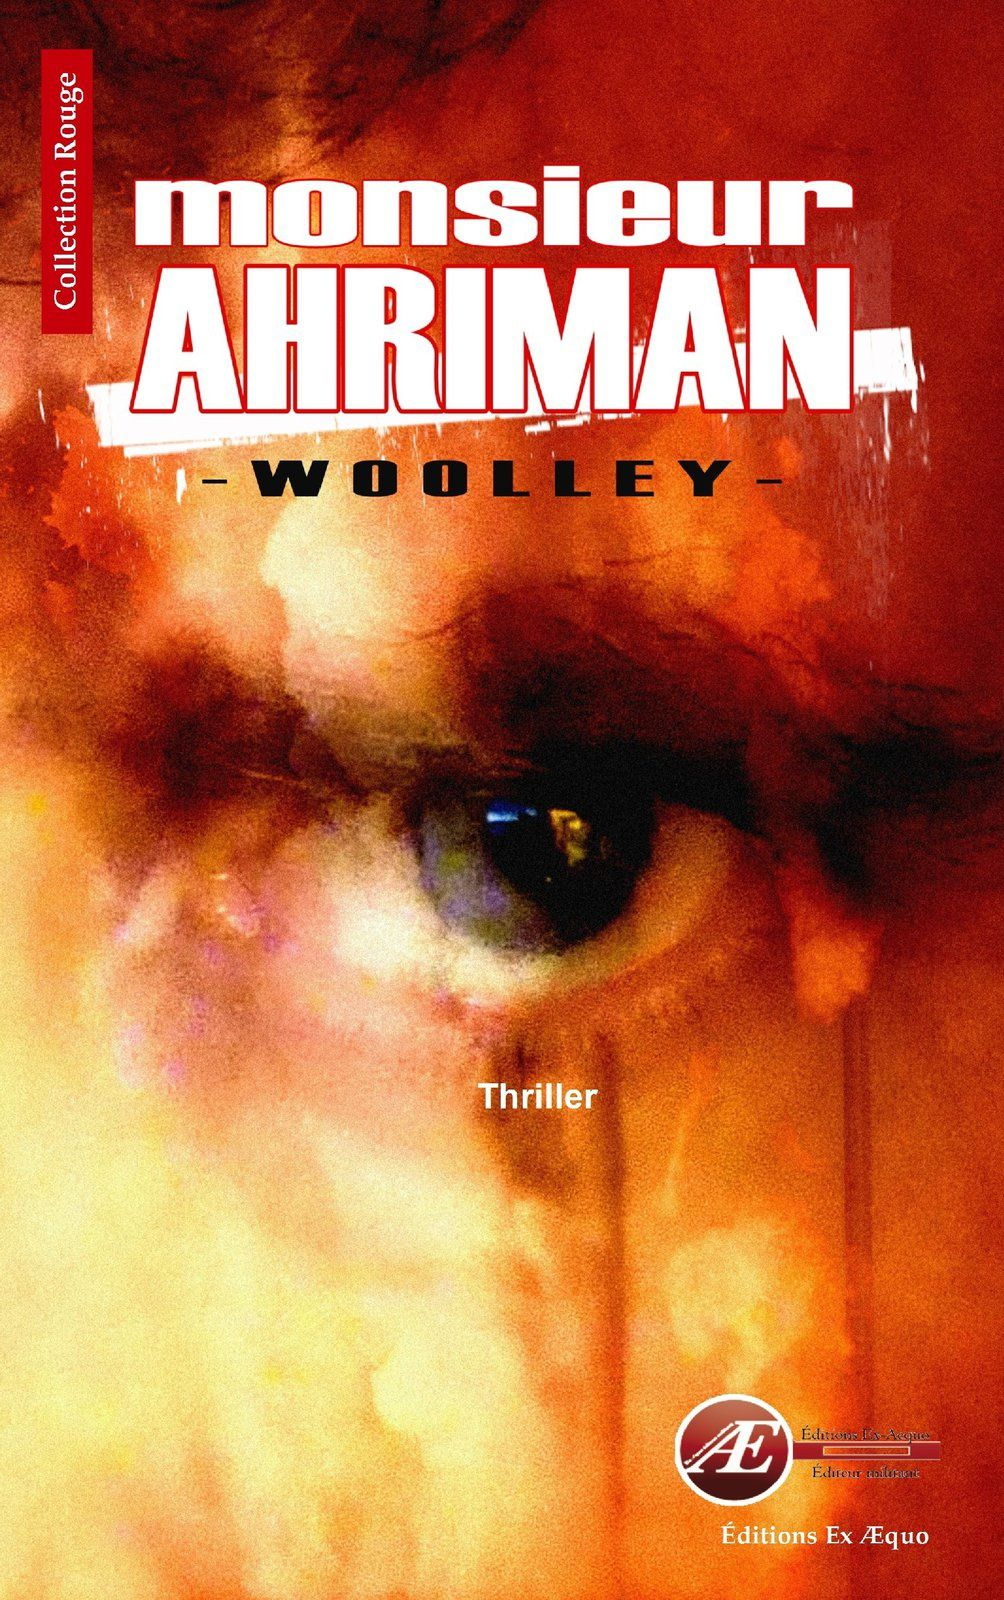 Chronique de Monsieur Ahriman de Woolley